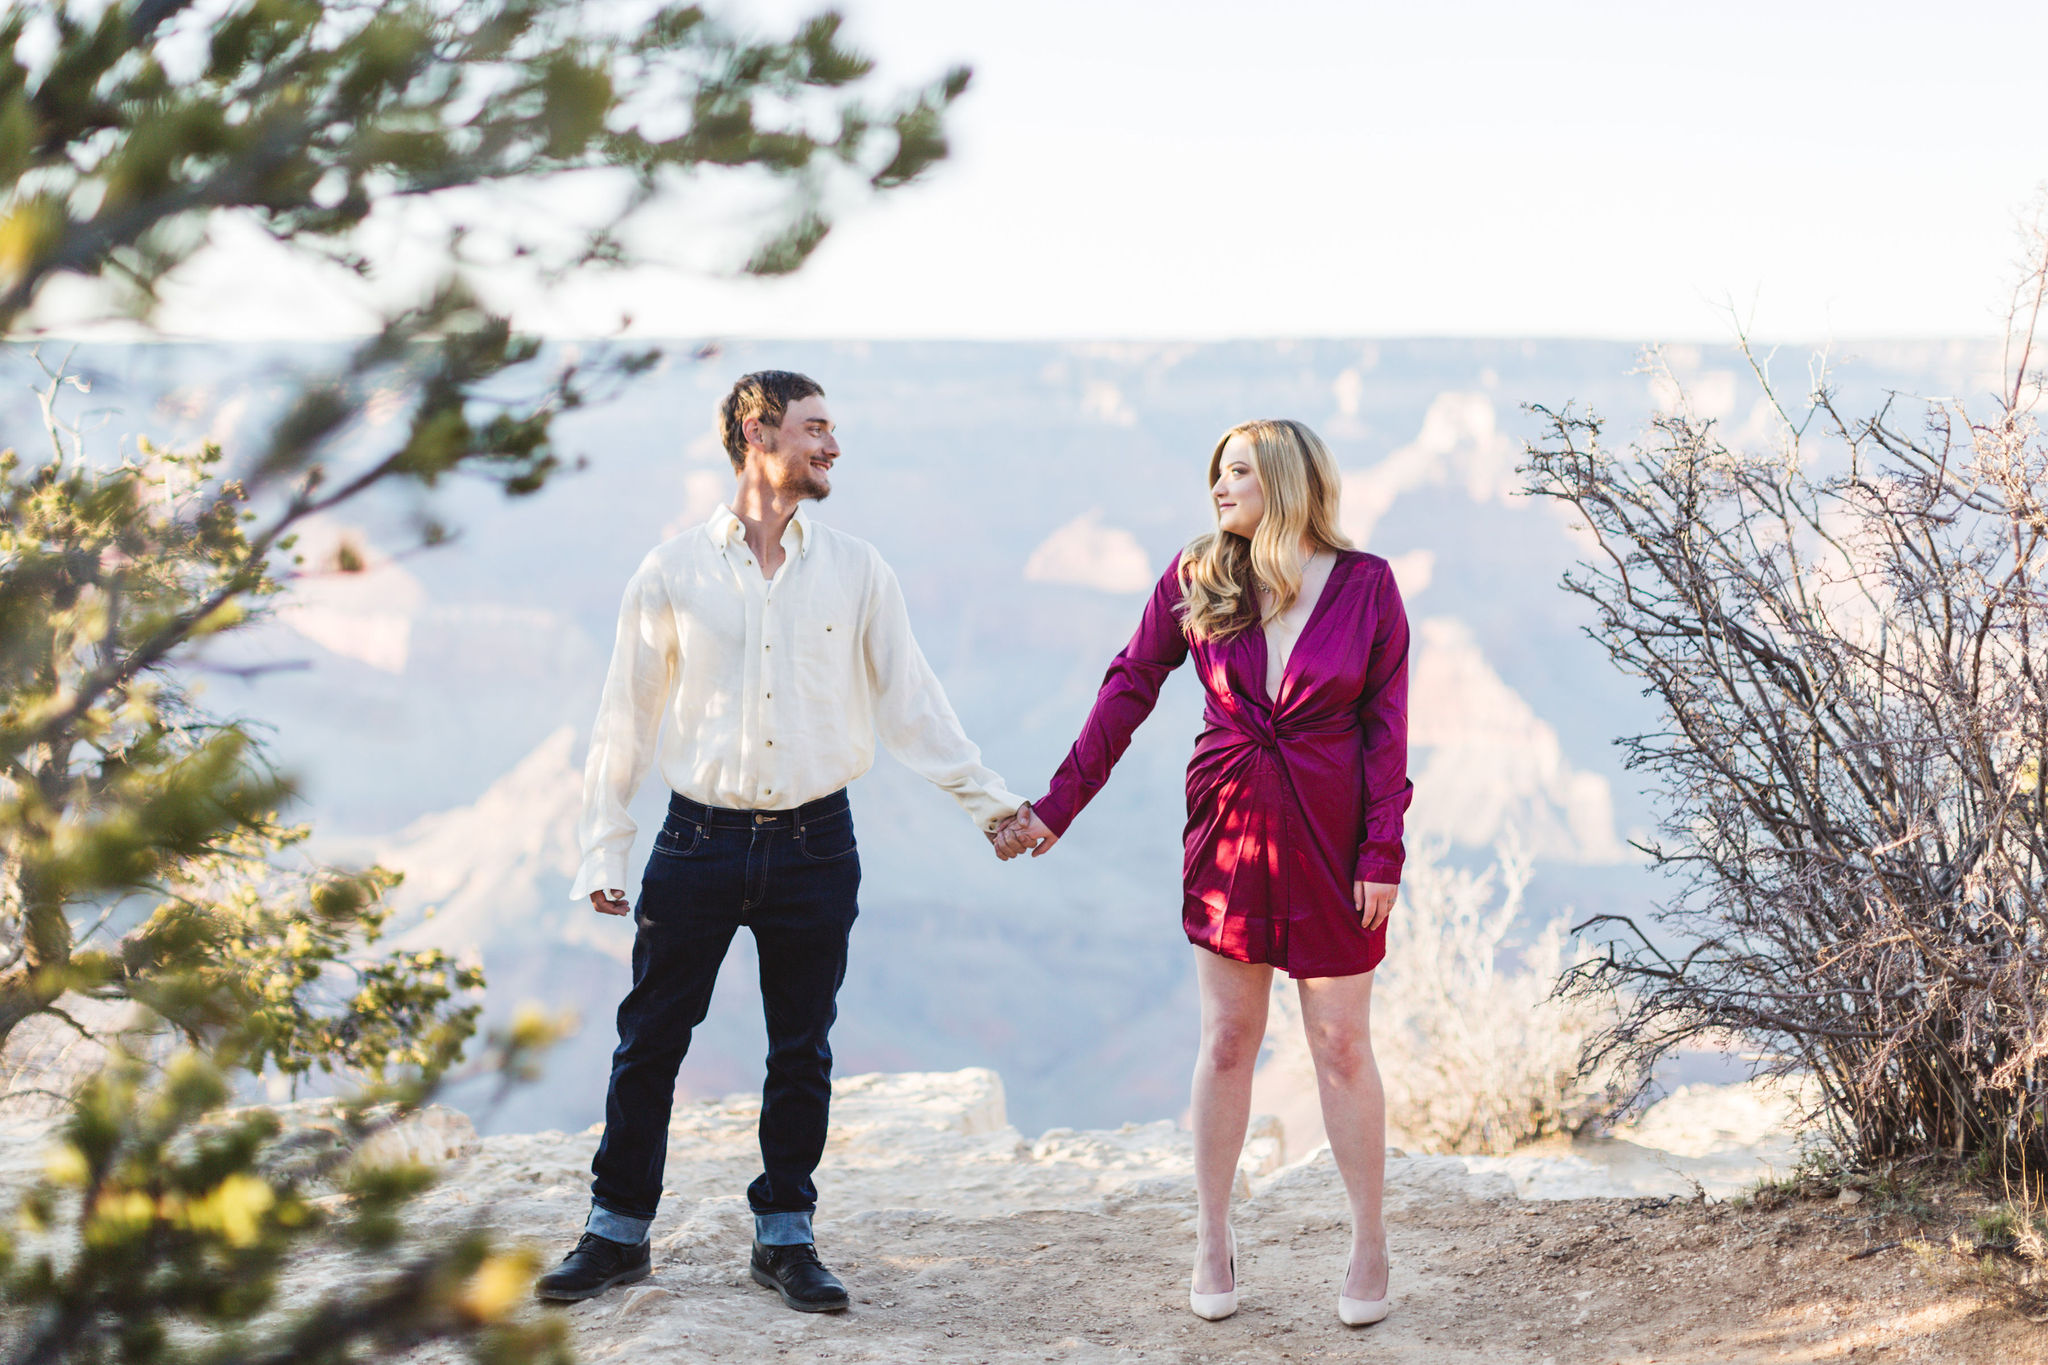 Christiana-David–Engagement-Zoe-Larkin-Photography-22